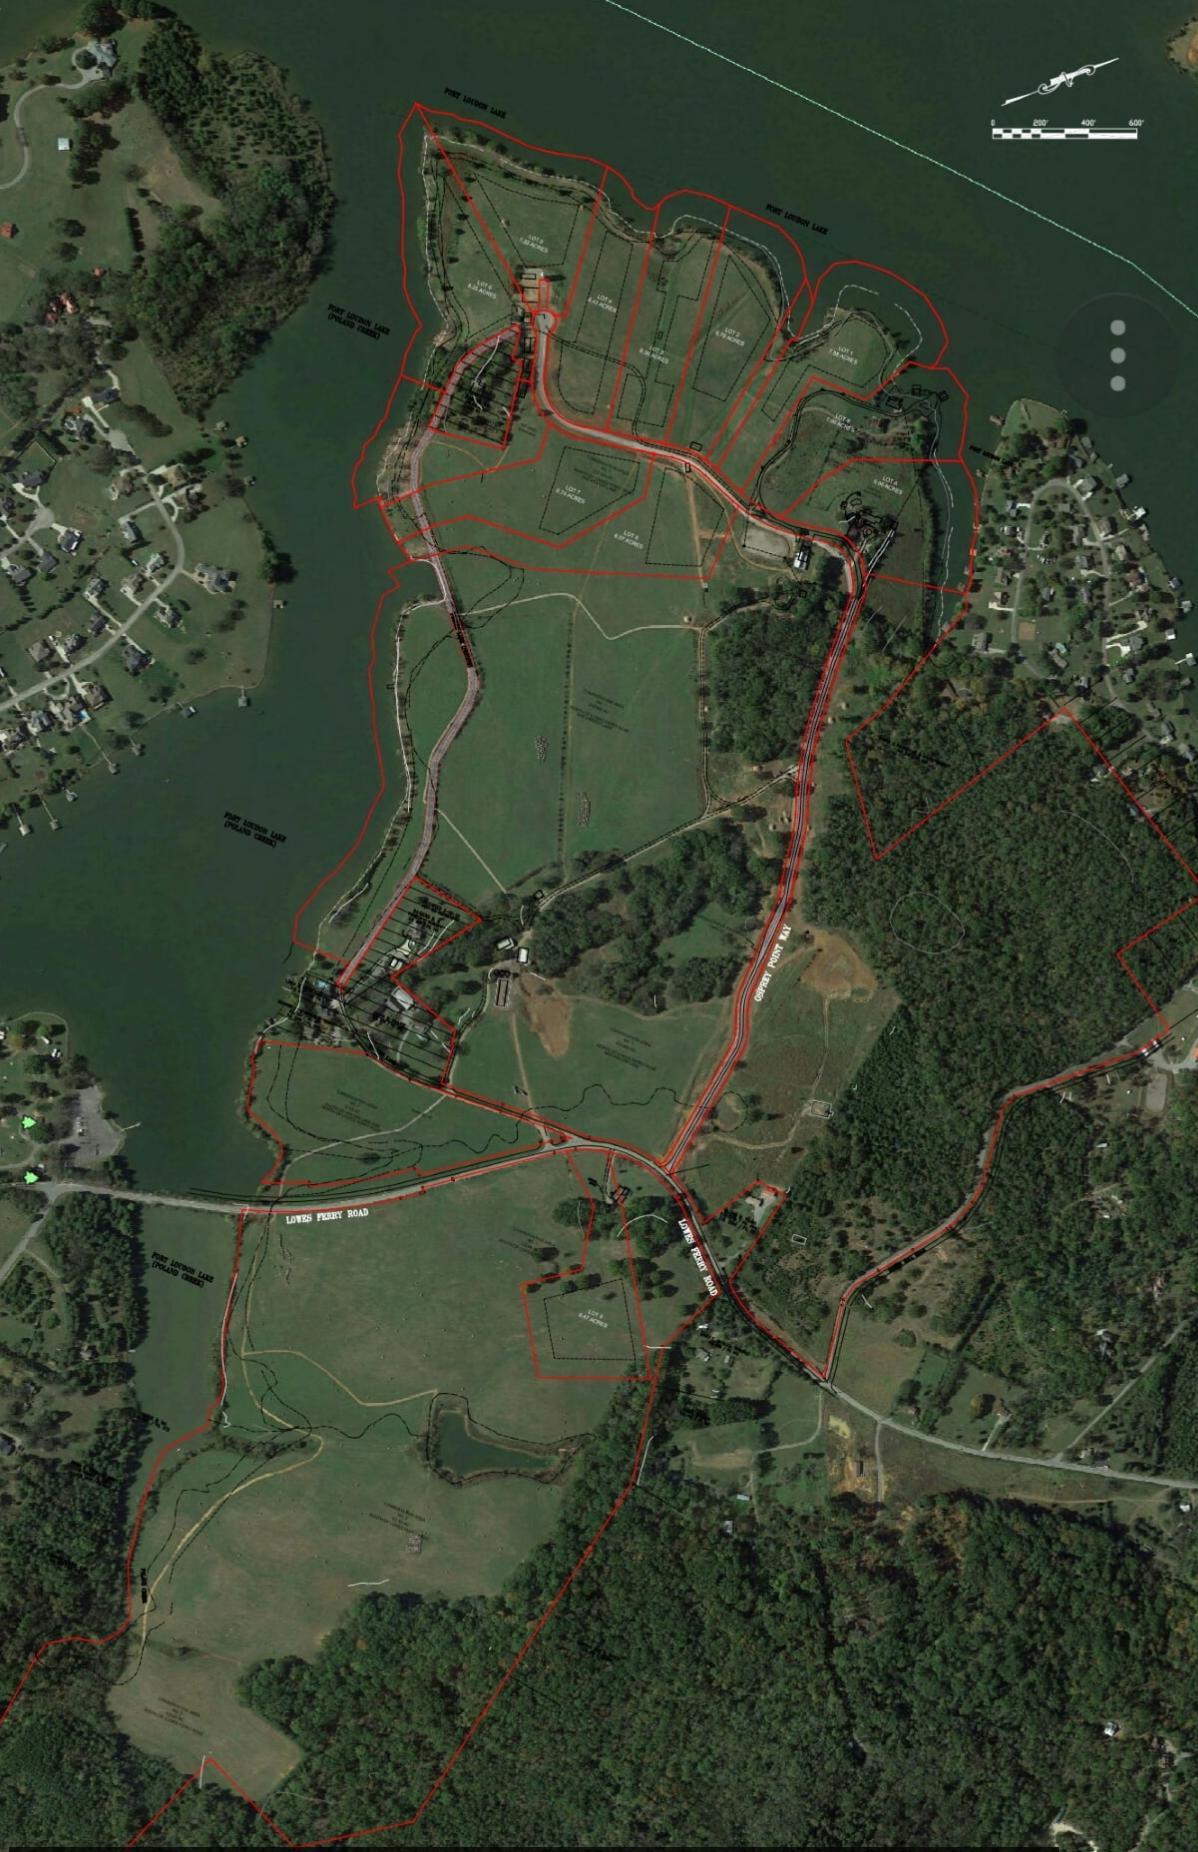 259 Osprey Point: